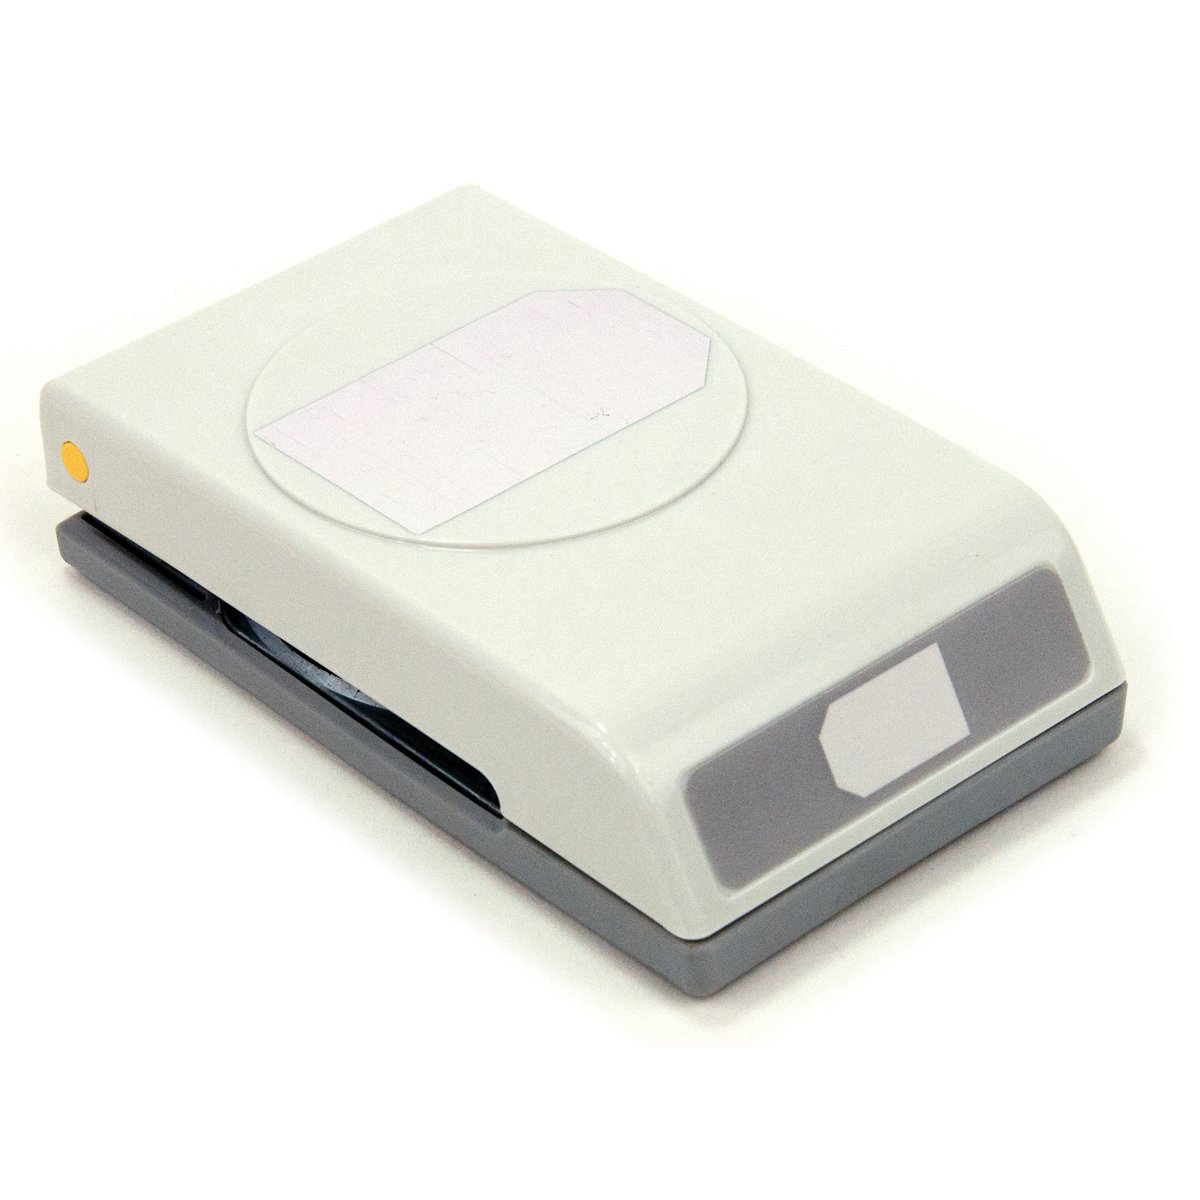 Wellco 16W GR8 2D 2 Pin Lamp WEL8316 2700K 240V 138mm x 141mm 360 Degree